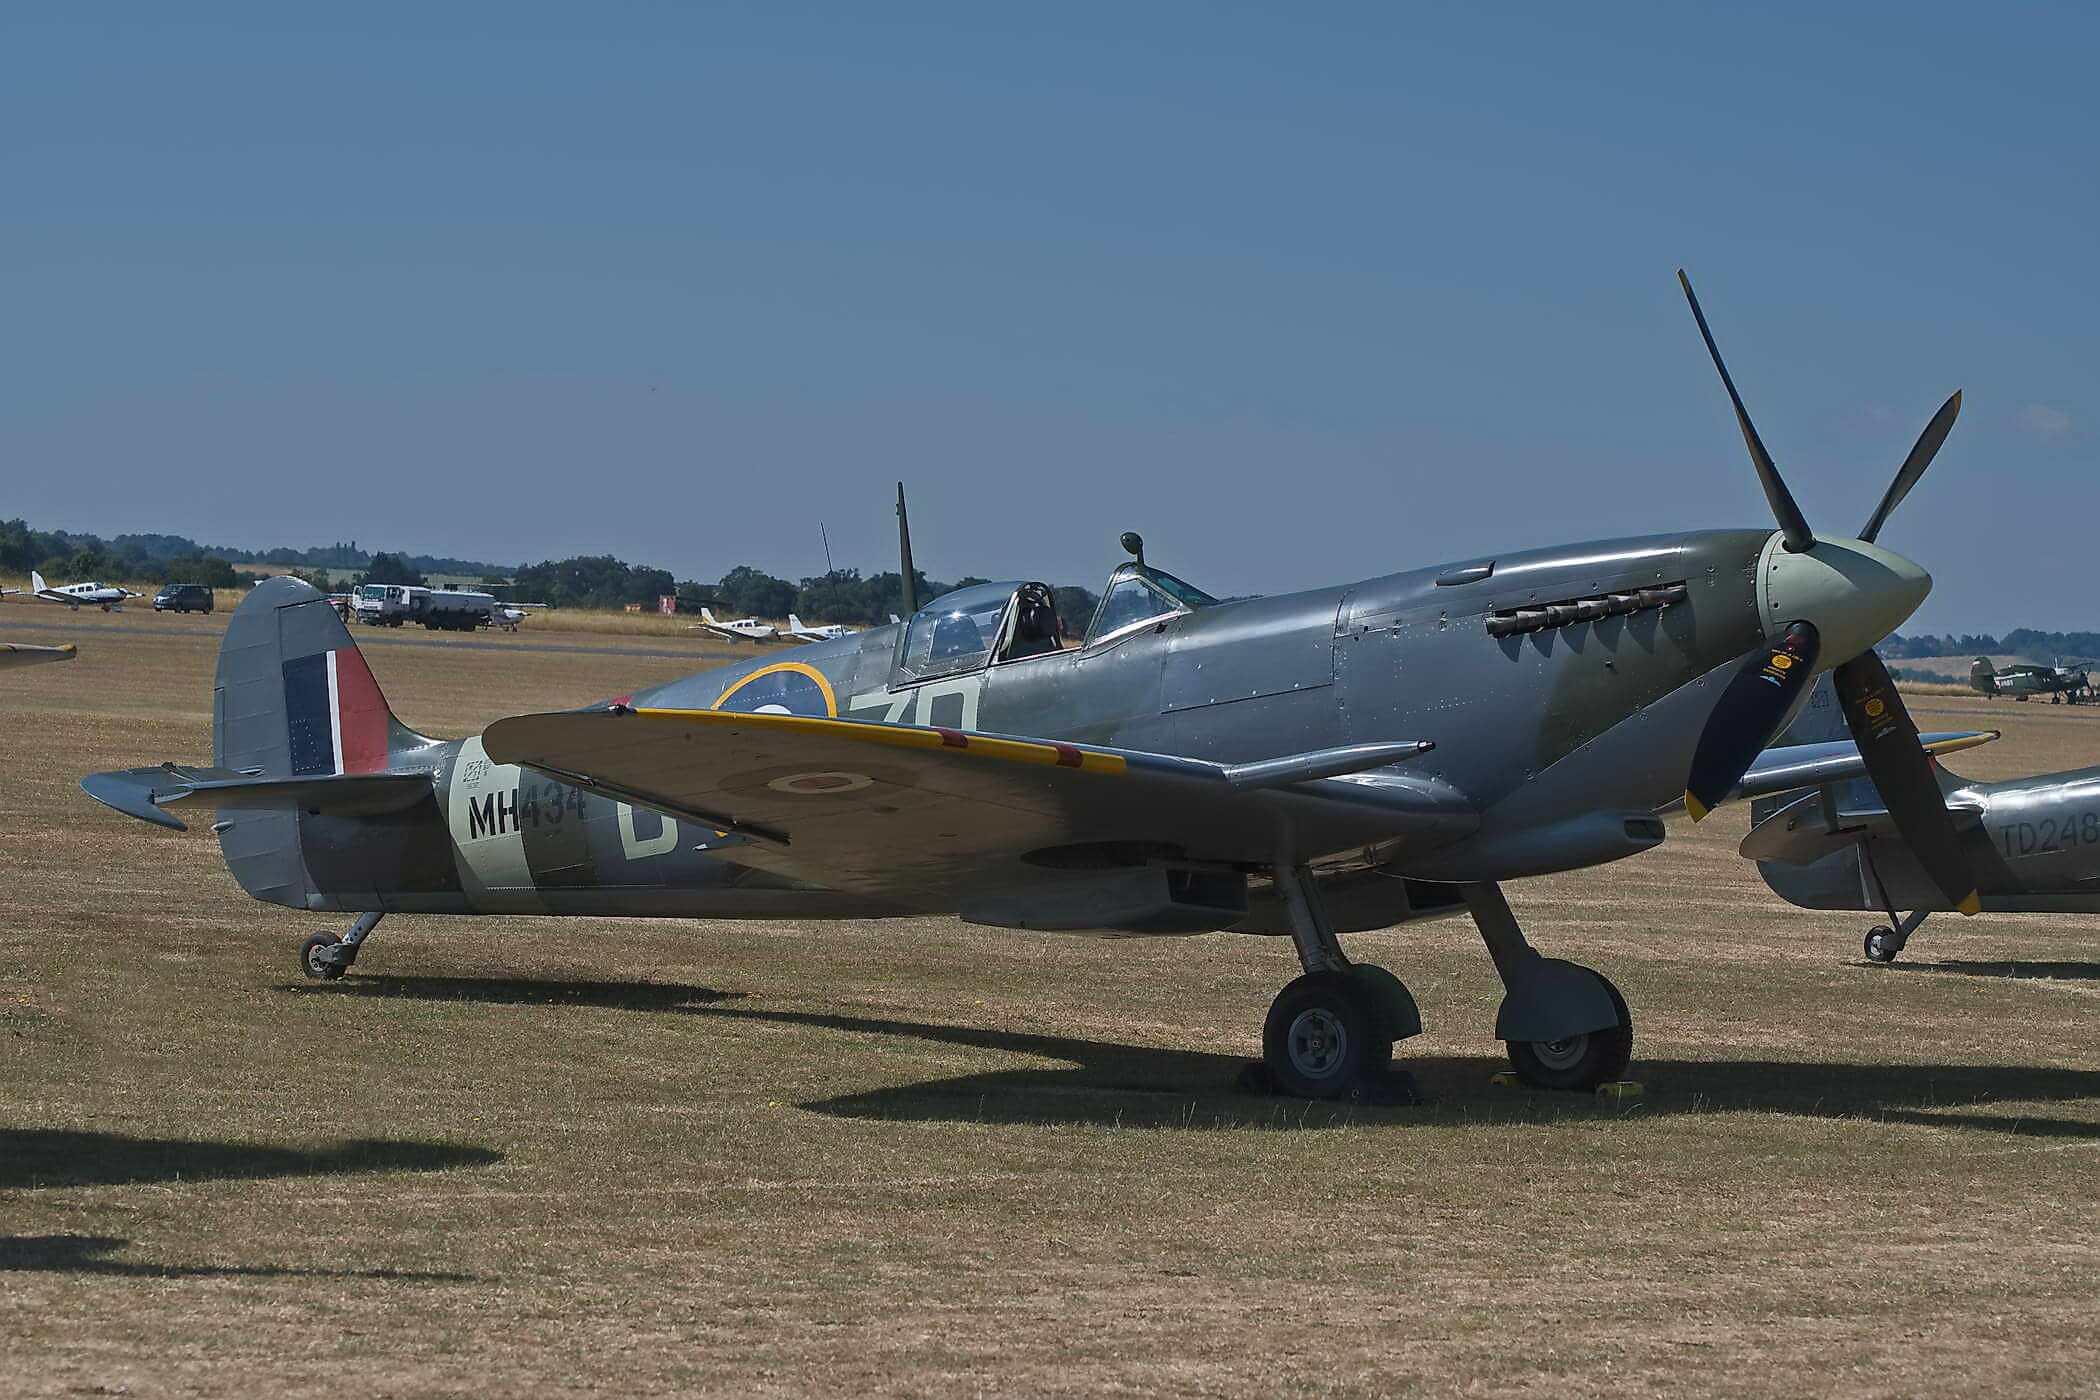 Spitfire F IX MH434